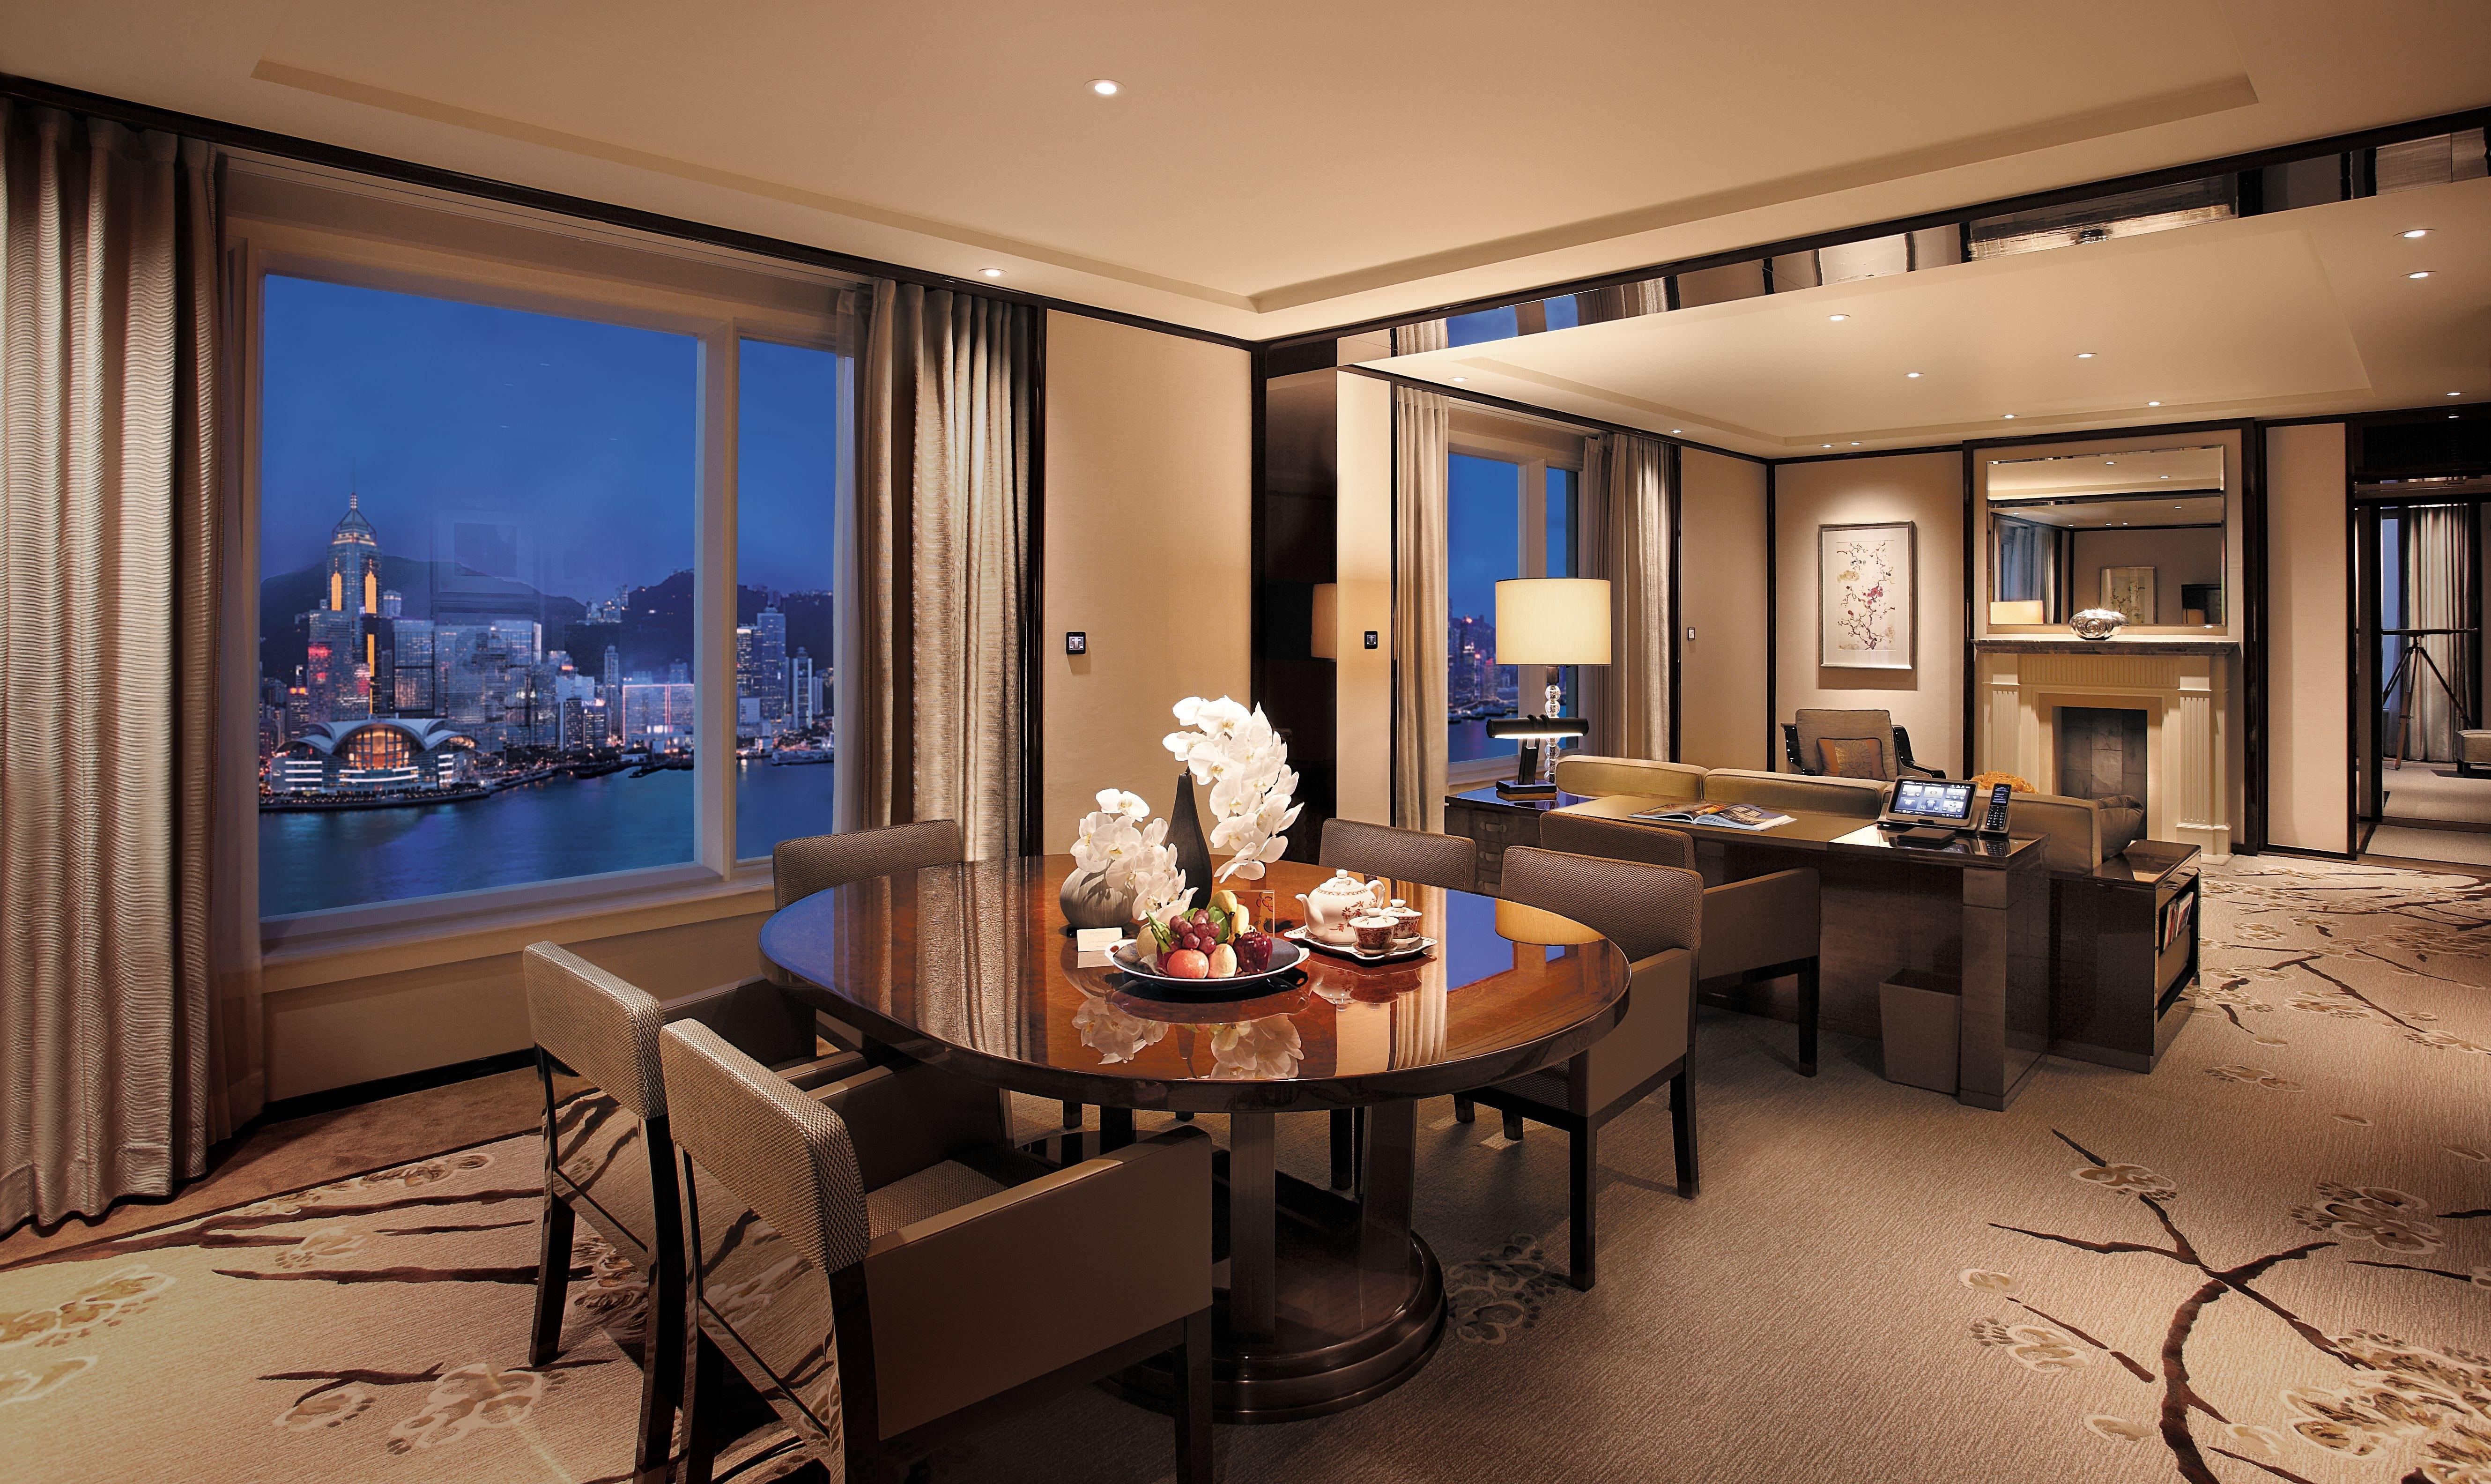 The Peninsula Hong Kong: Alle 300 Gästezimmer und Suiten werden umfassend modernisiert